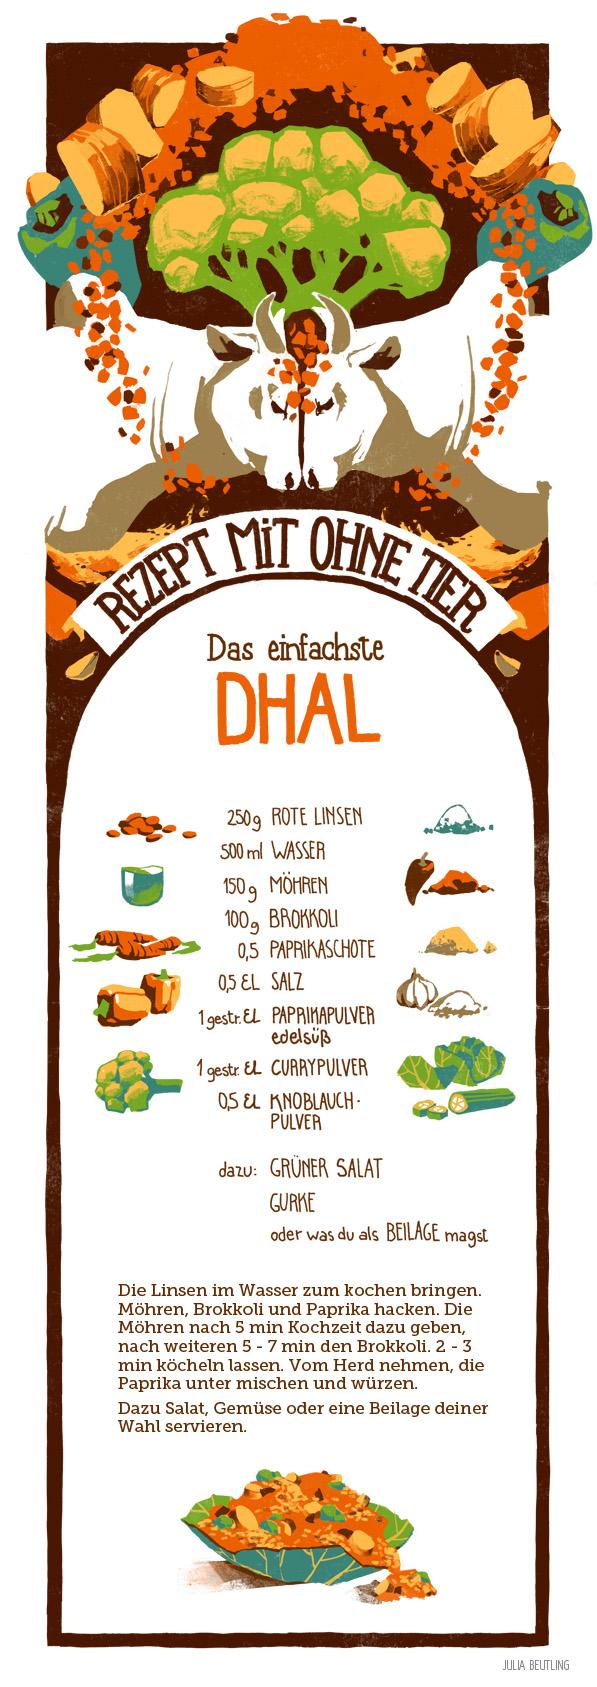 WEB rezept 4 DE dhalB